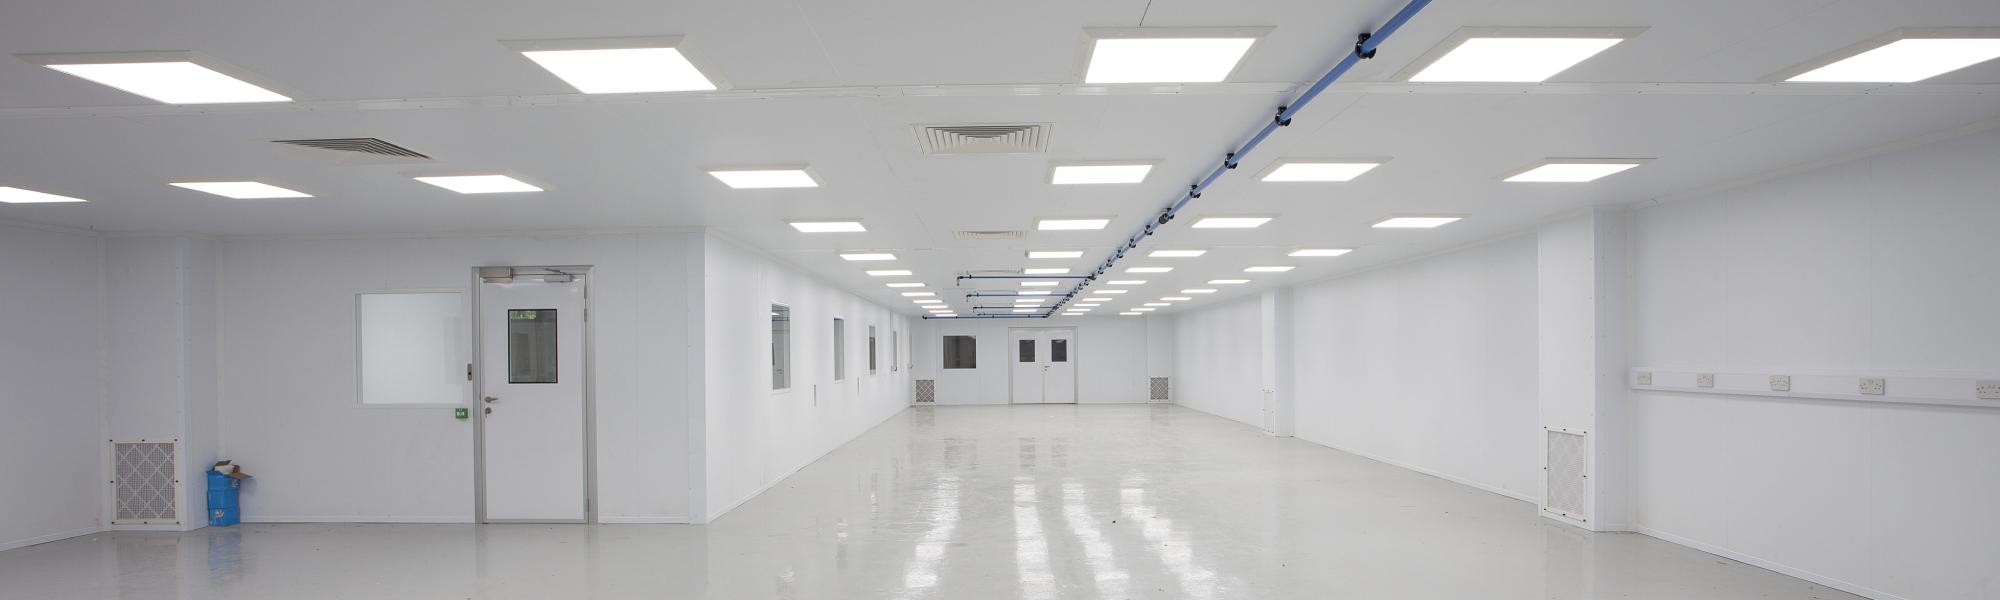 Monmouth Scientific | PIR Modular Cleanroom